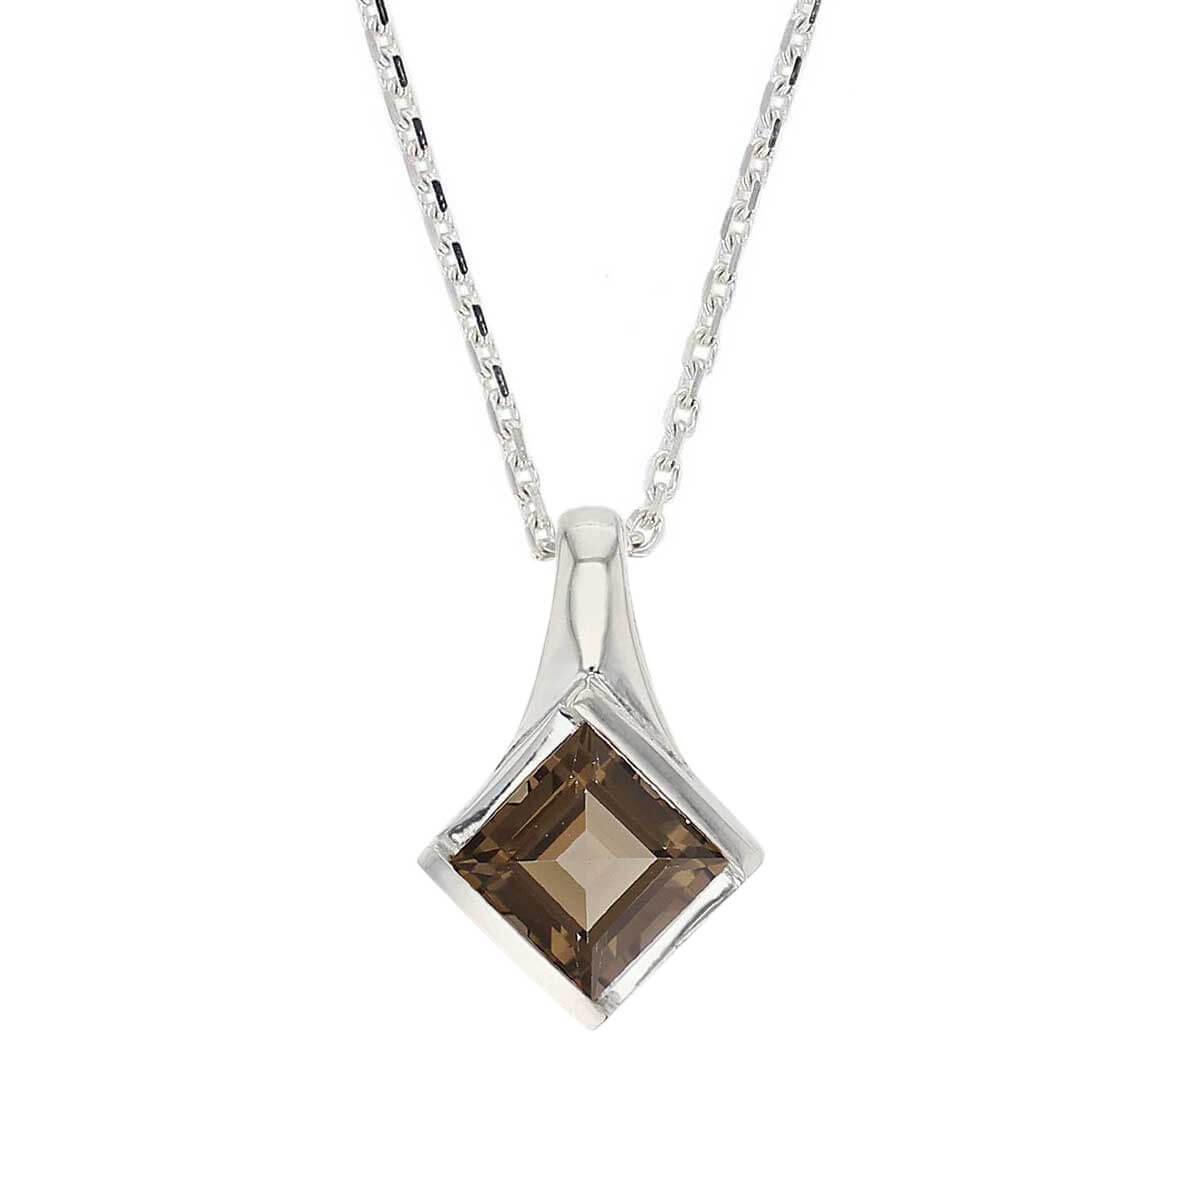 sterling silver princess cut faceted smoky quartz gemstone pendant, designer jewellery, square brown quartz gem, jewelry, handmade by Faller, Londonderry, Northern Ireland, Irish hand crafted, darcy, D'arcy, smokey